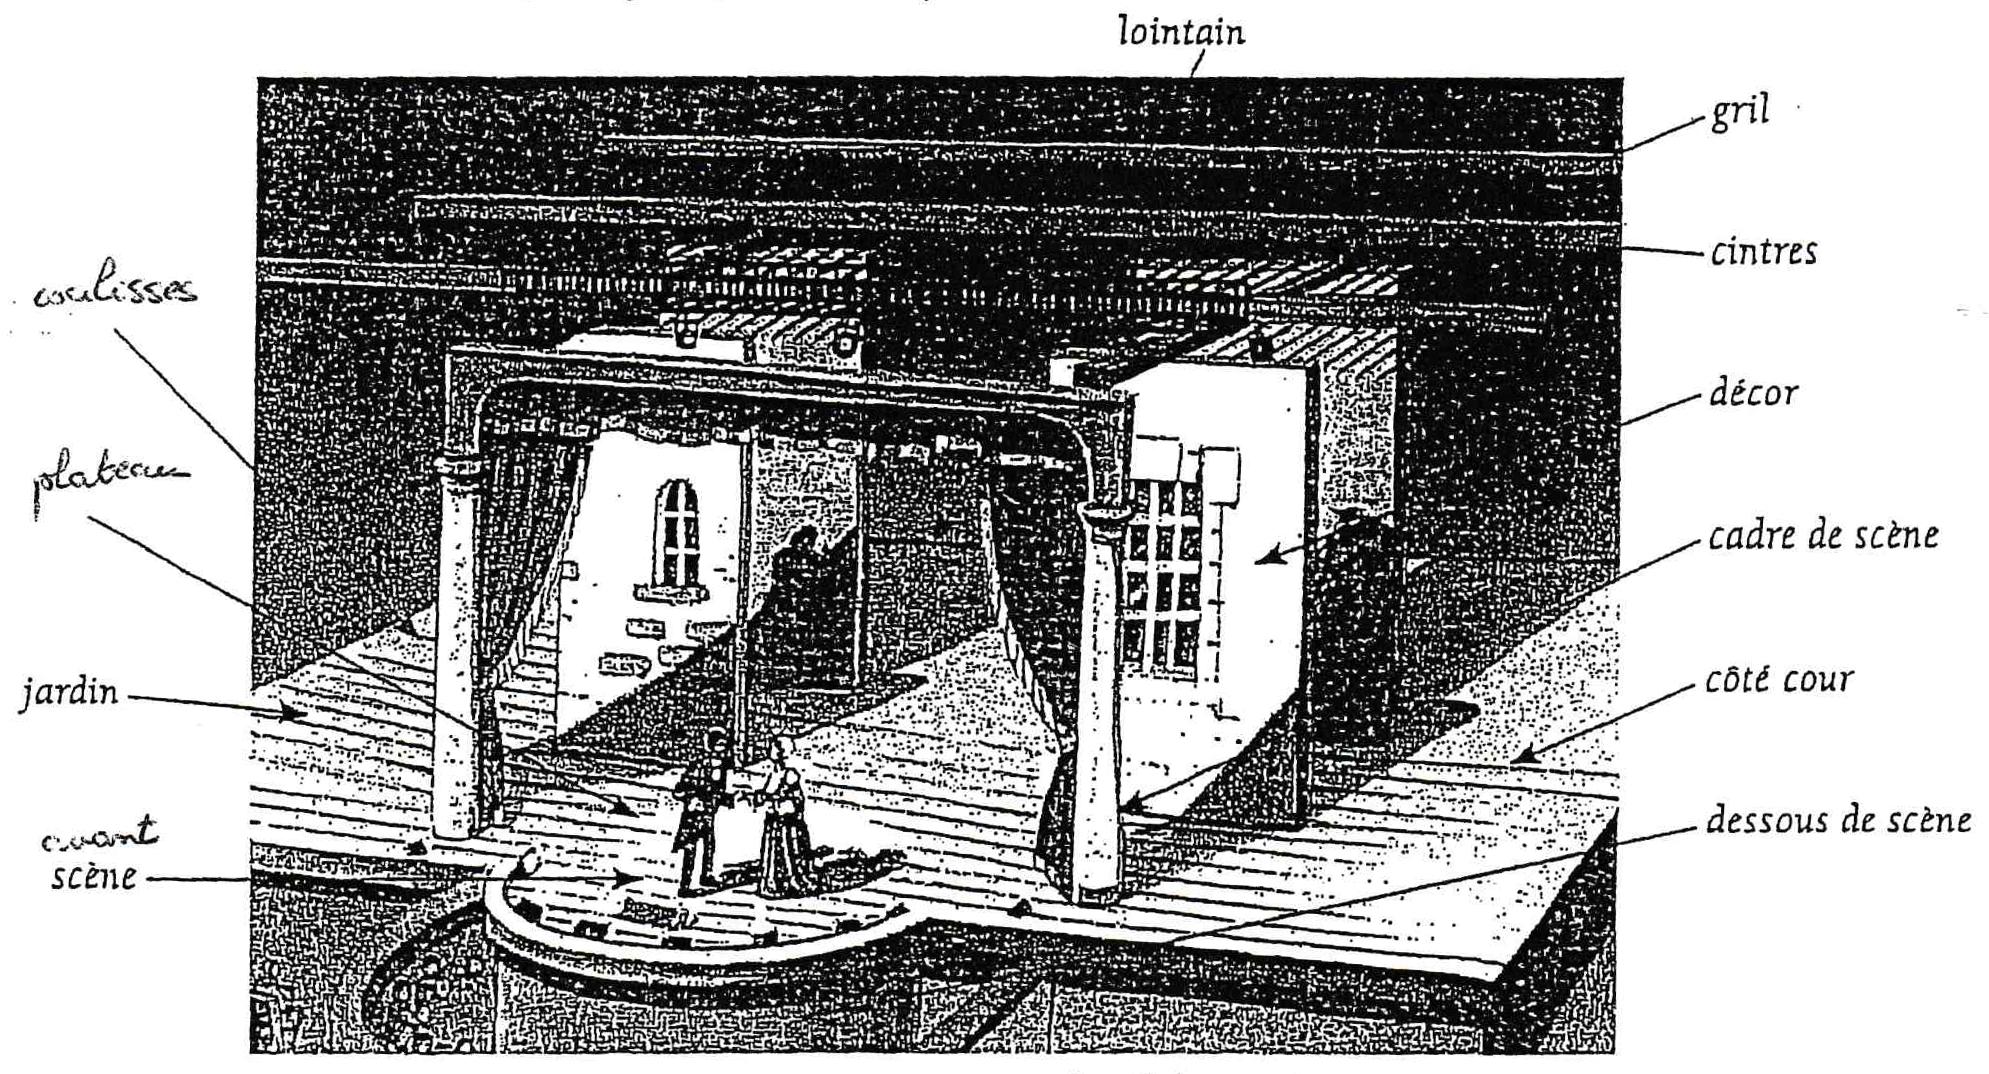 Fichier:Schéma du théâtre et son organisation.jpg — Wikiversité